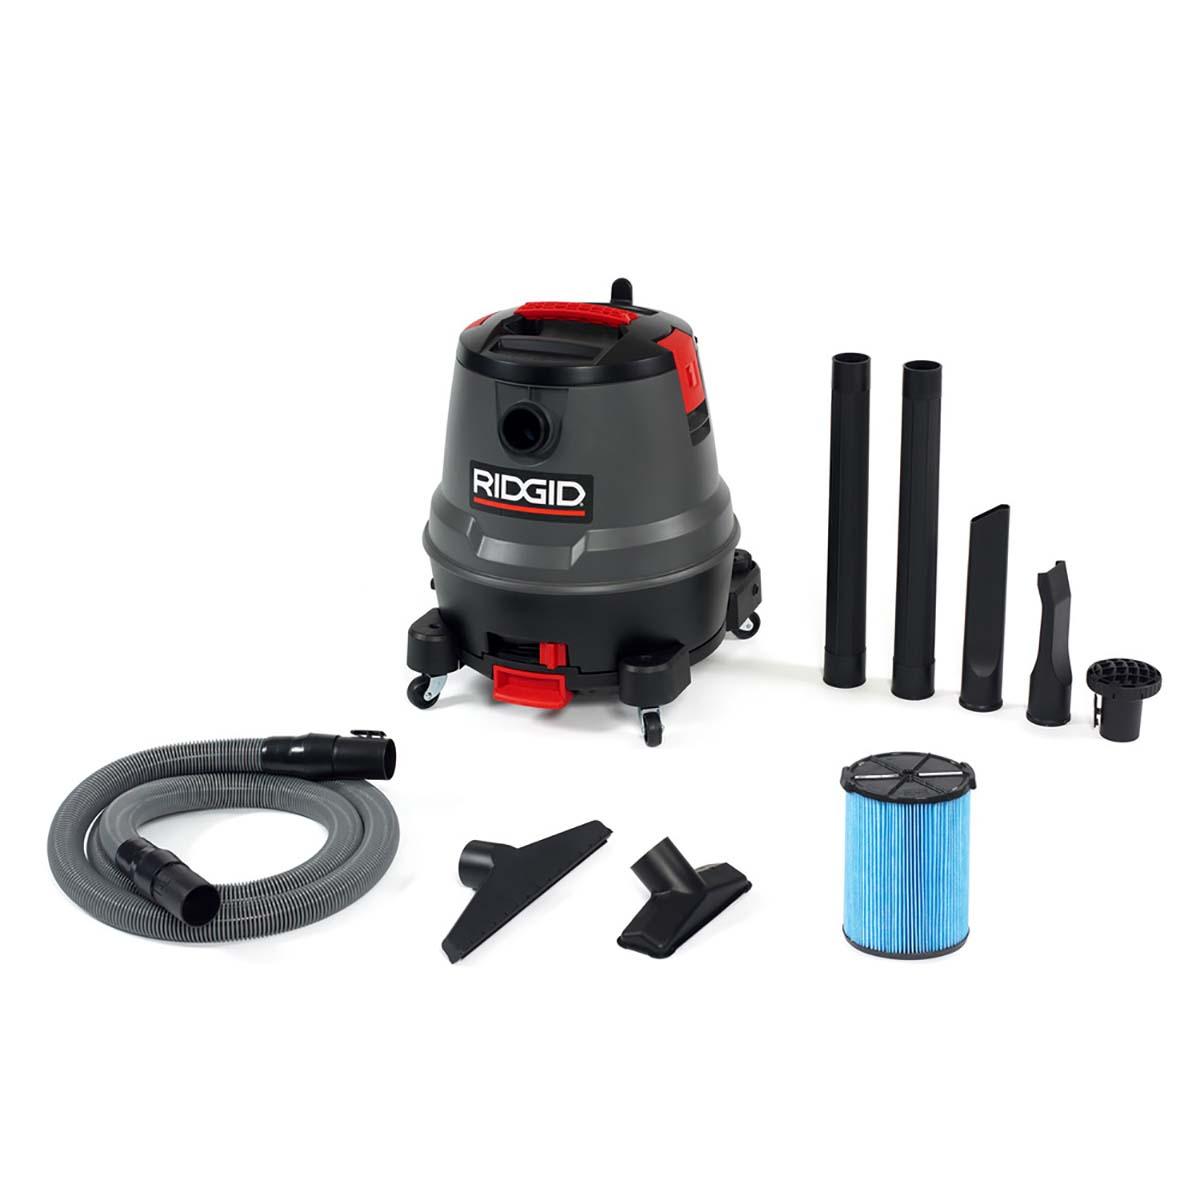 12 Gallon Motor-On-Bottom Wet/Dry Vac (1250RV)